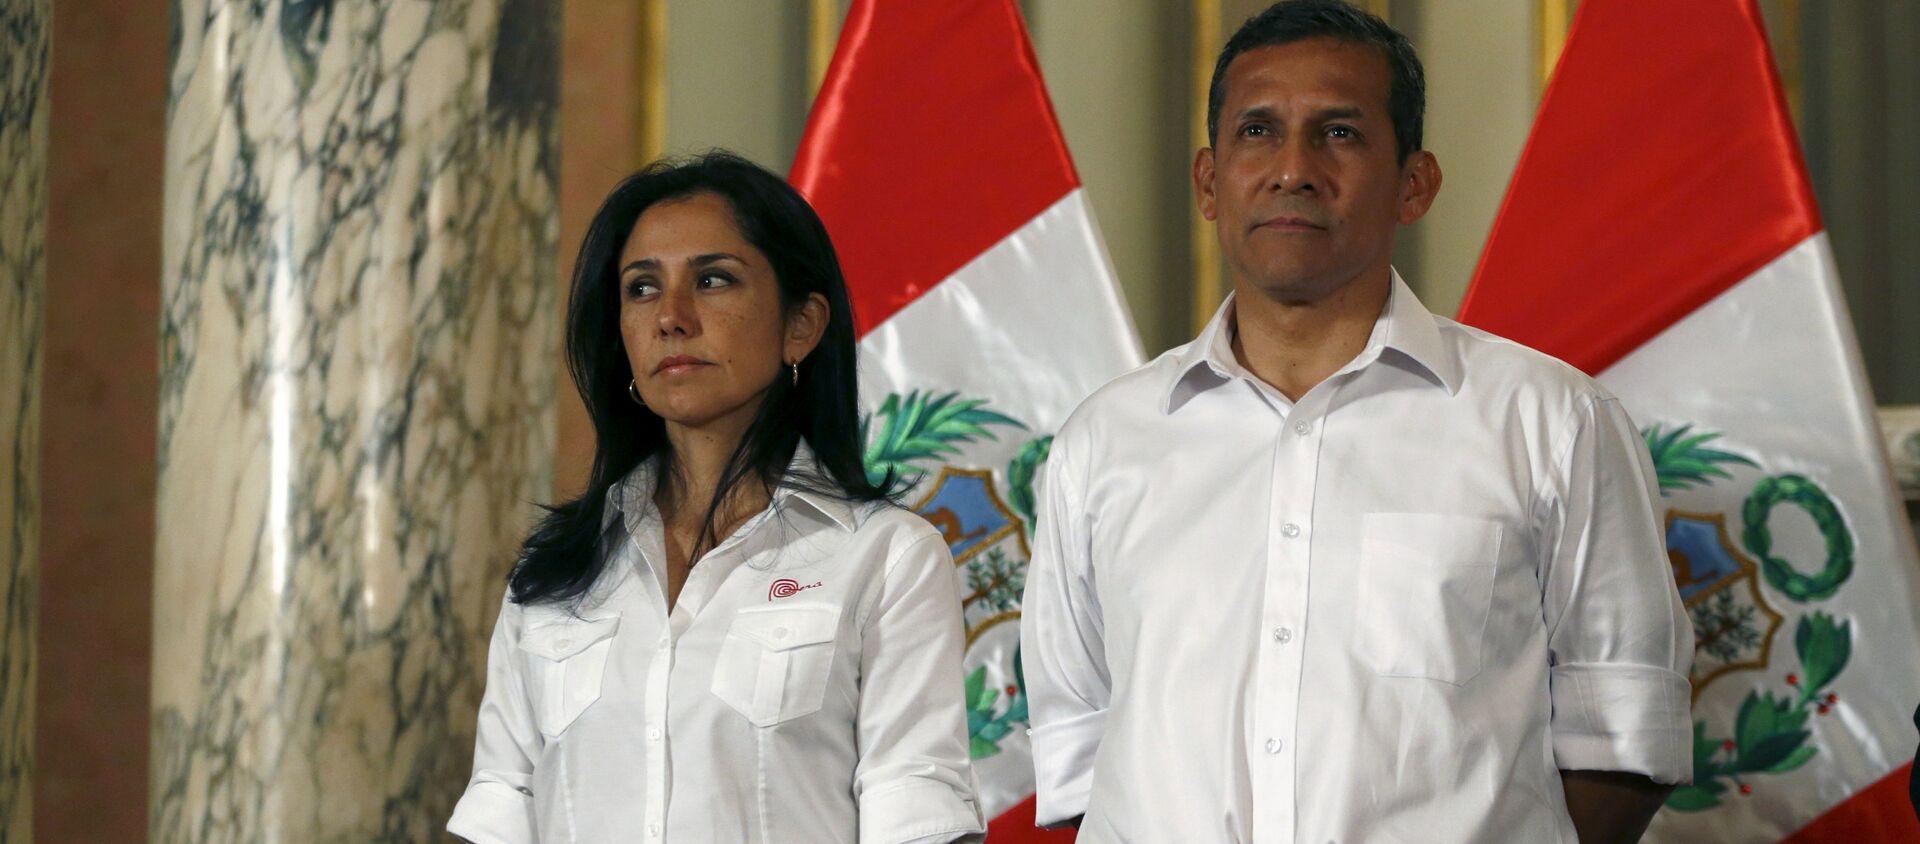 El expresidente de Perú, Ollanda Humala, junto a su mujer, Nadine Heredia - Sputnik Mundo, 1920, 18.09.2020